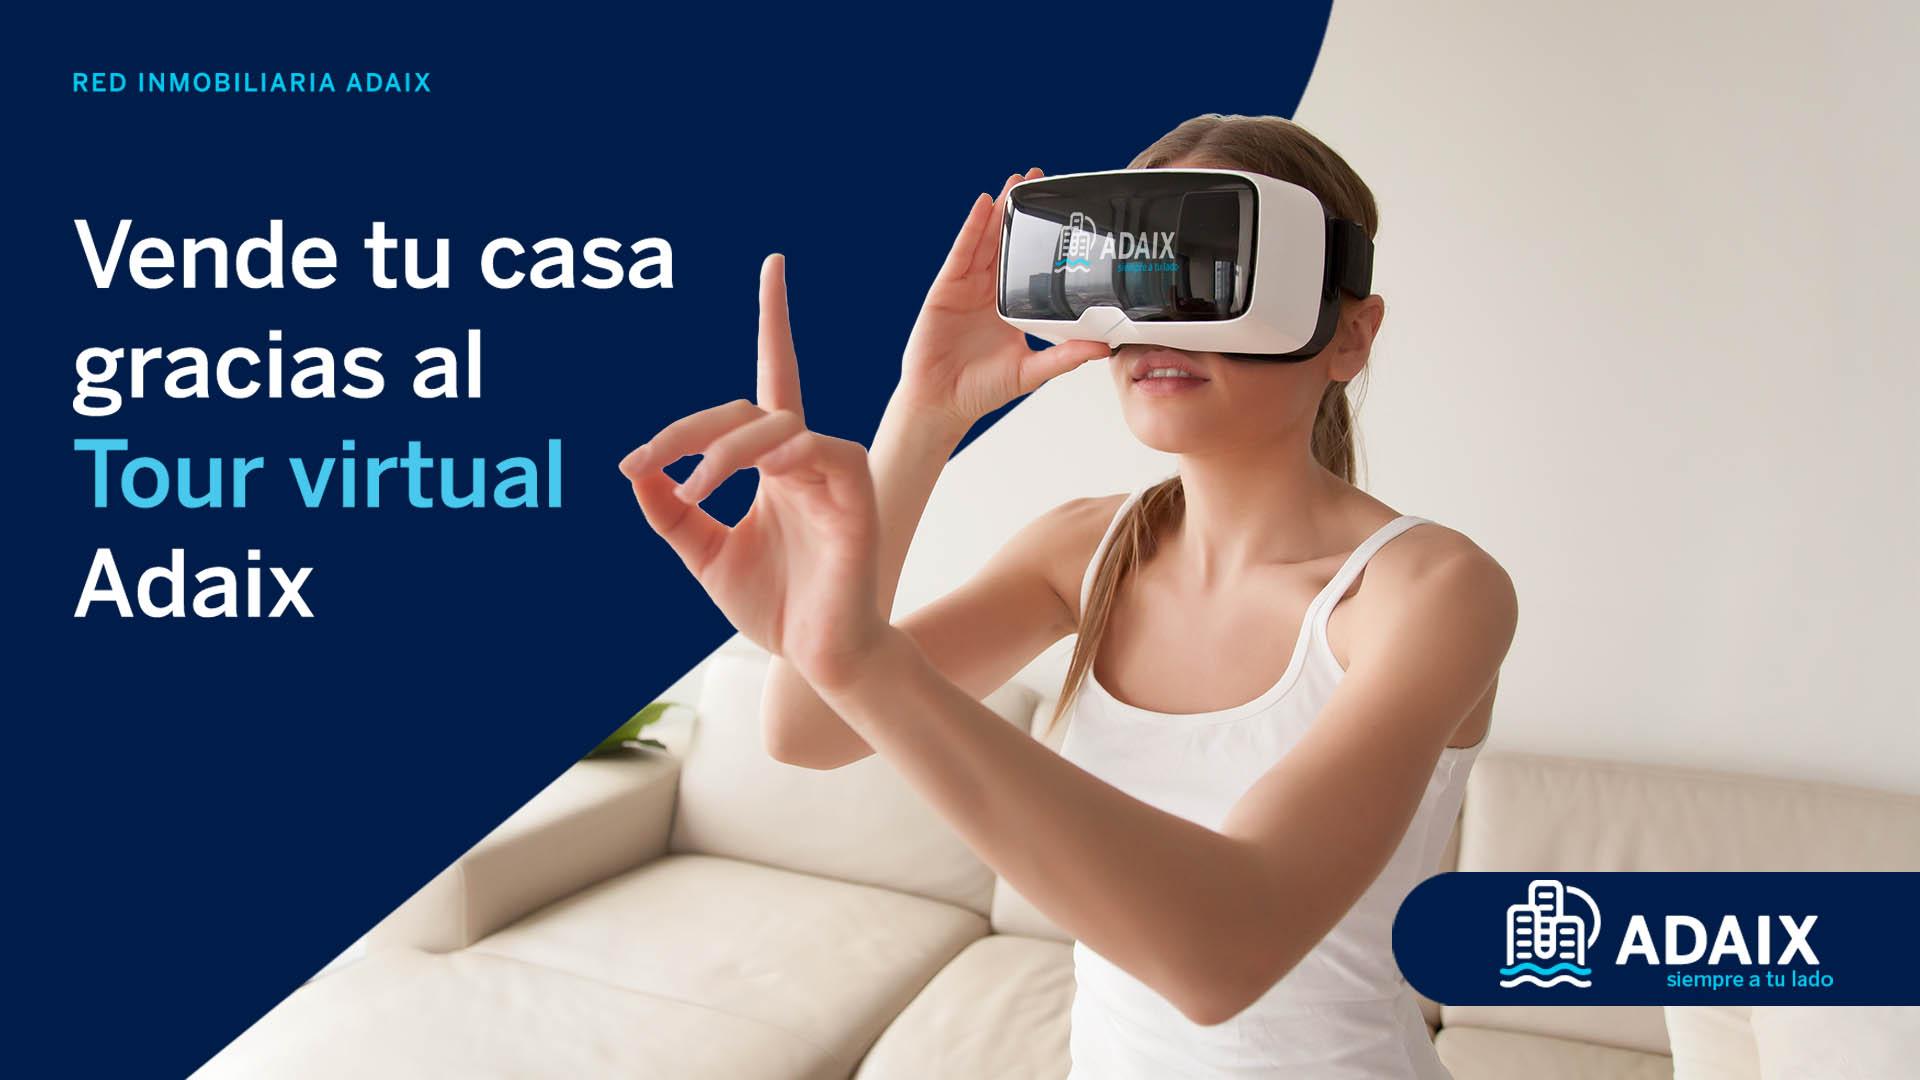 tour virtual adaix